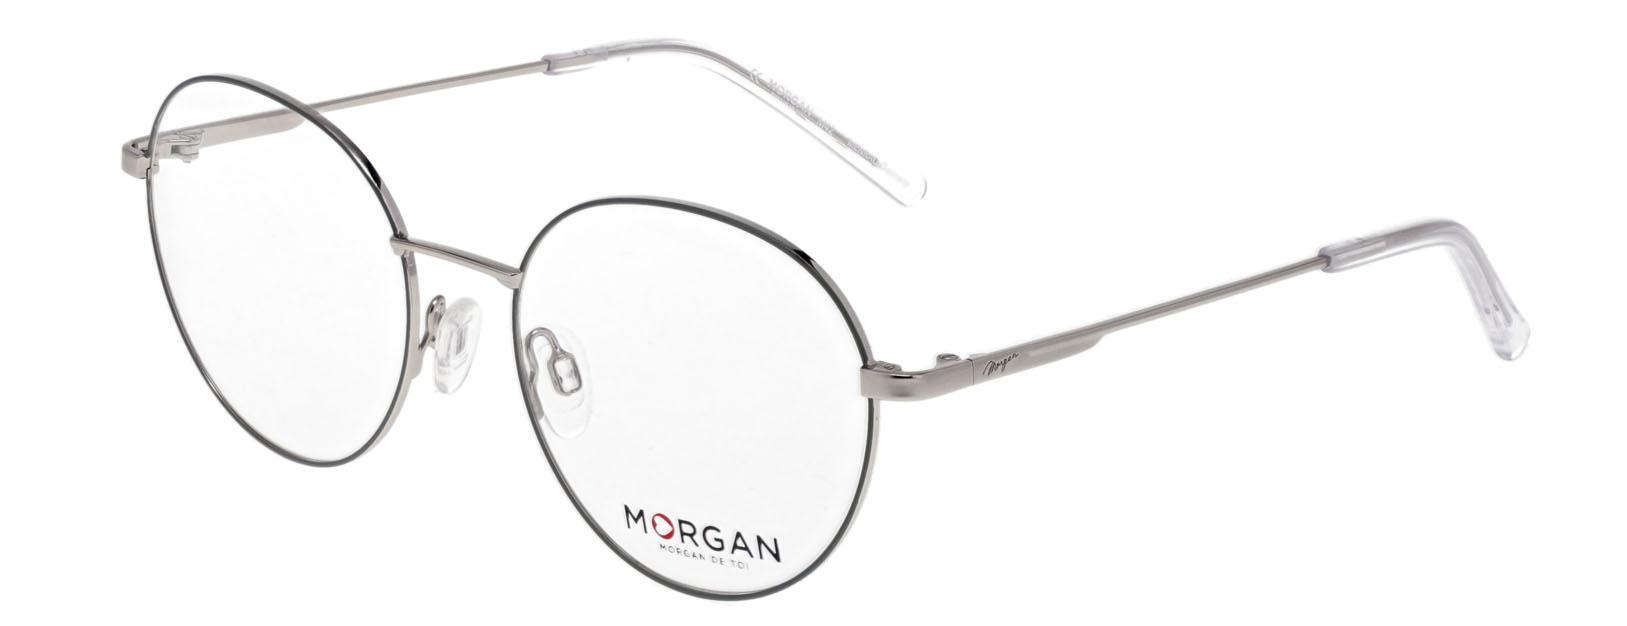 Morgan 203211 4100